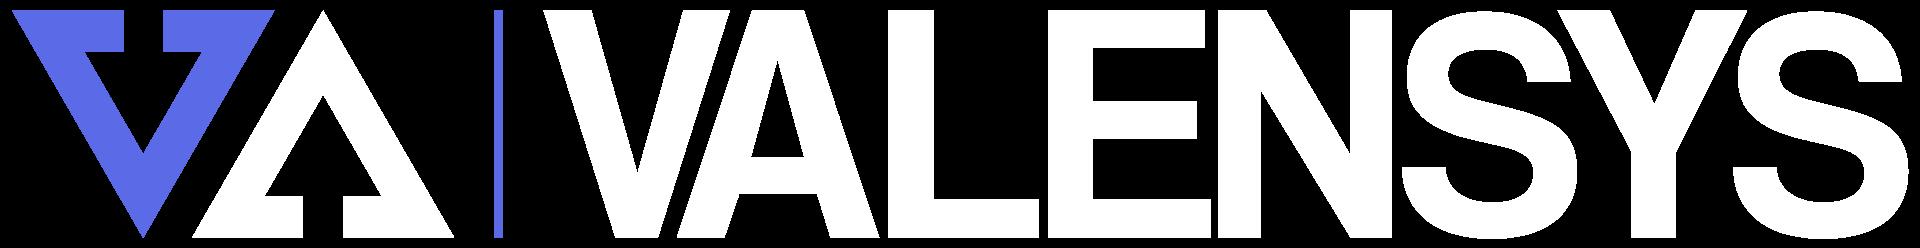 VALENSYS